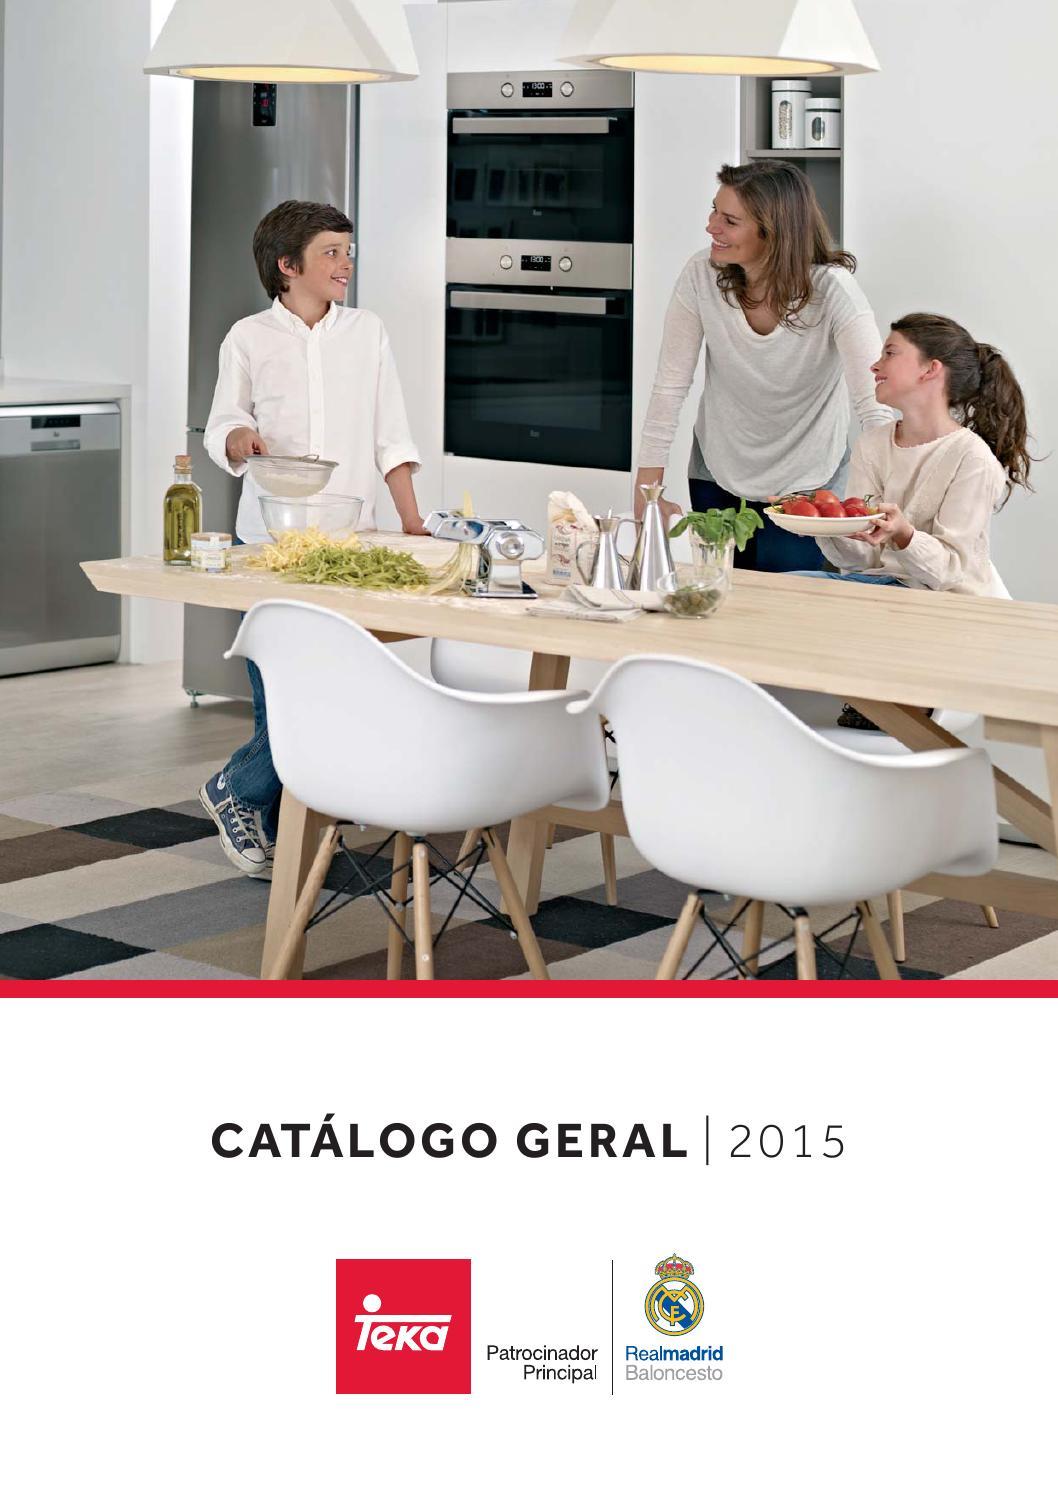 Cat logo teka 2015 by teka portugal issuu - Catalogo de teka ...